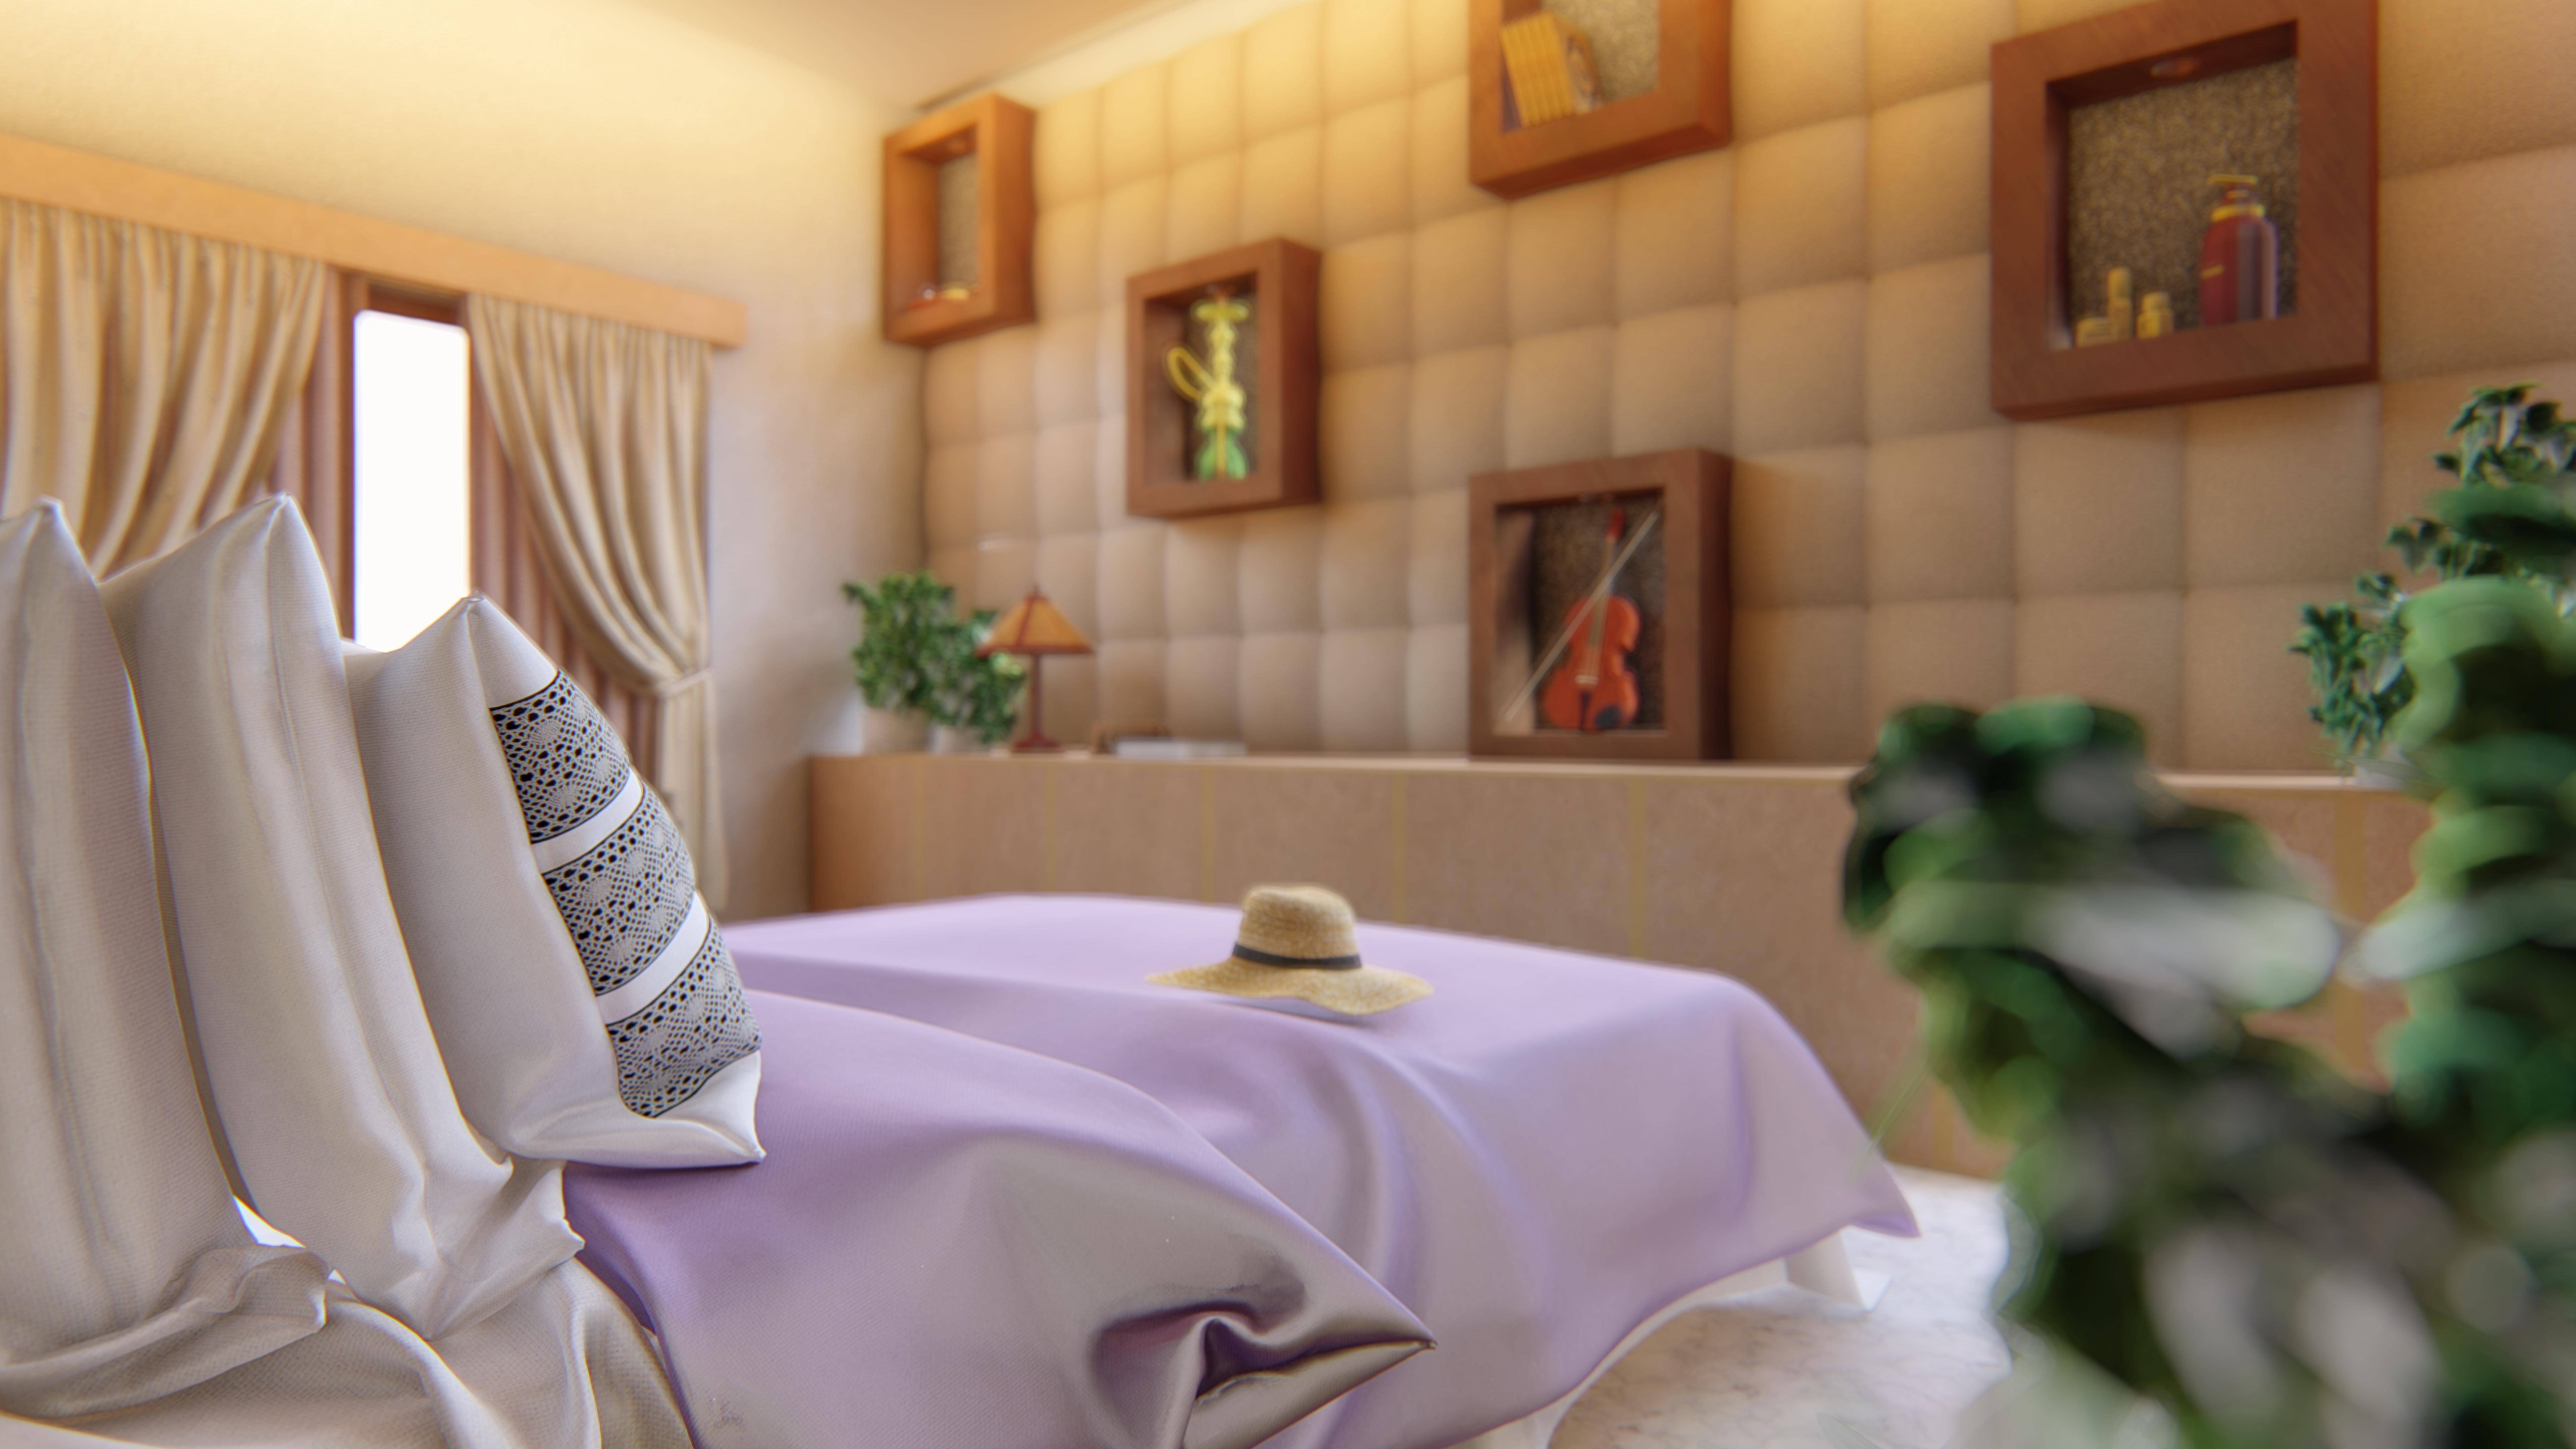 INTERIOR BEDROOMS (2).jpg